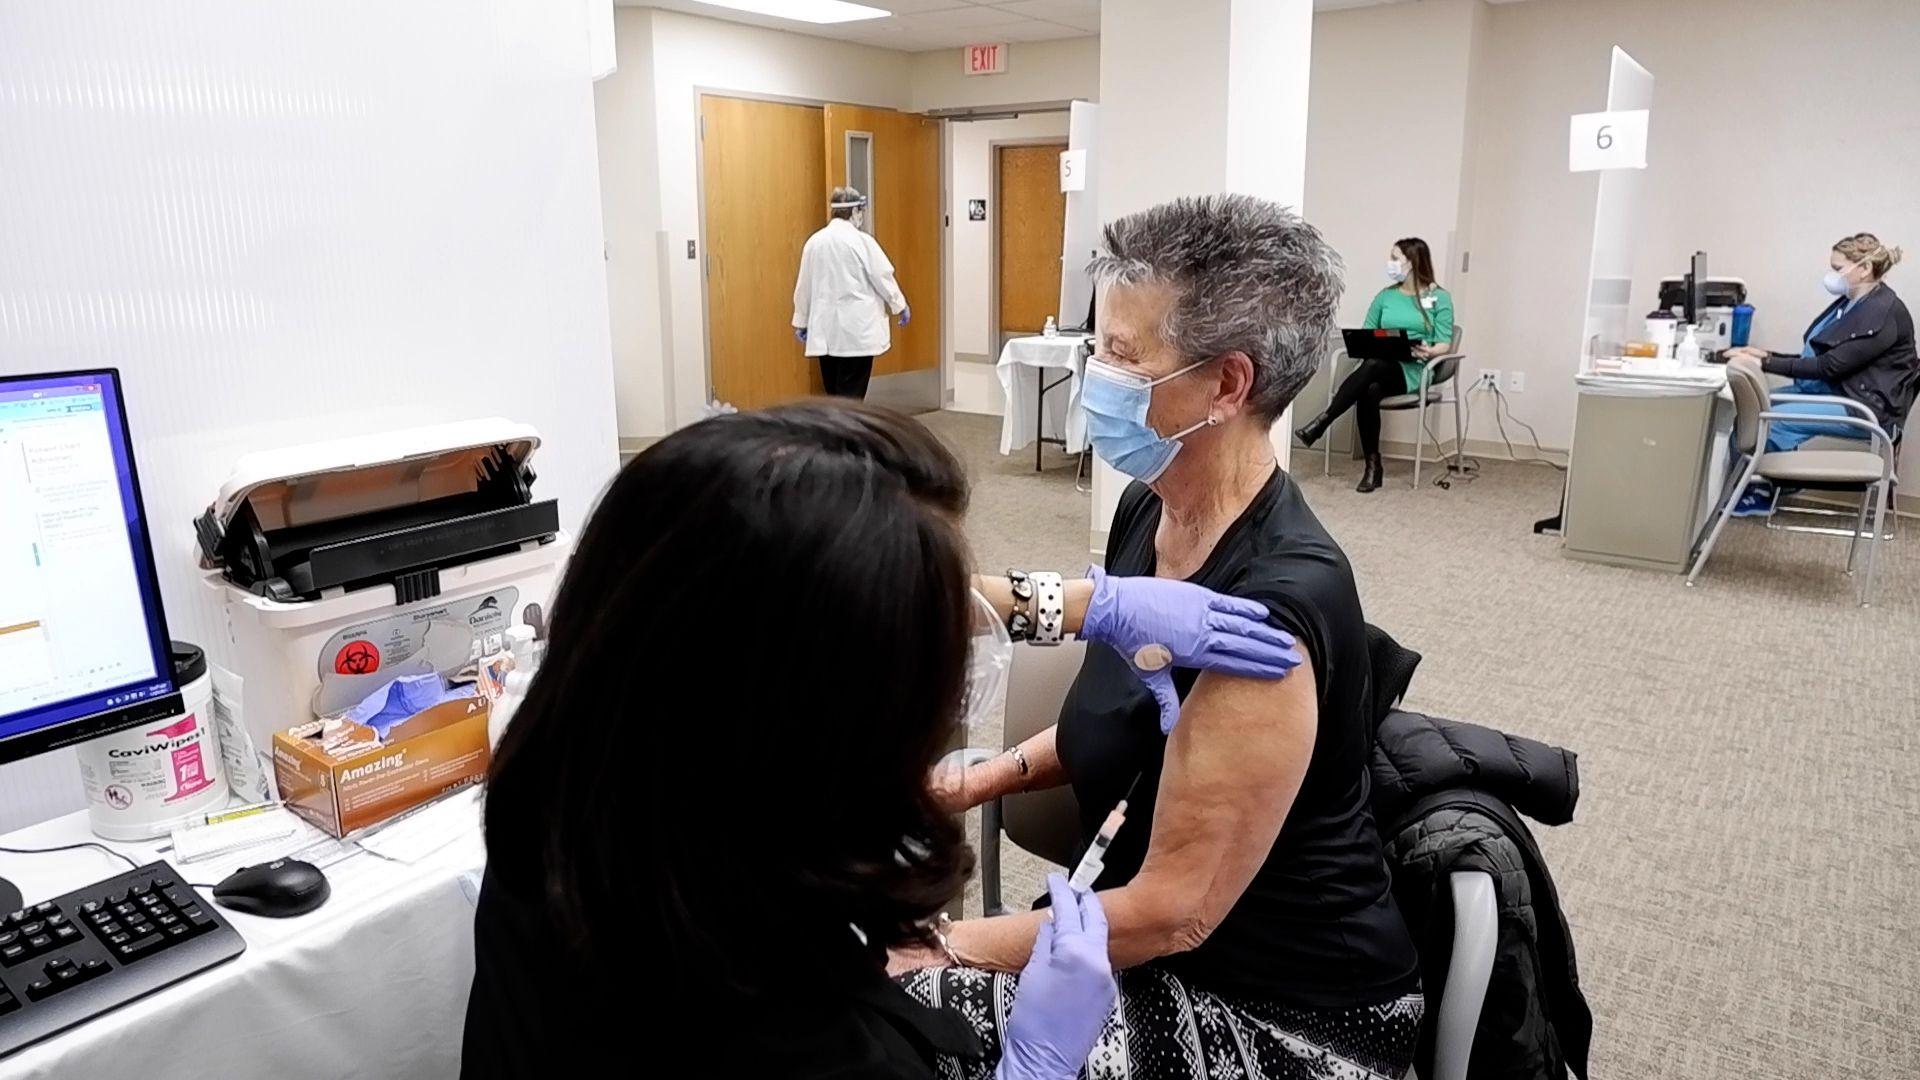 Woodstock resident Sandra Bradshaw prepares to receive the Moderna COVID-19 vaccine from nurse Gina Manon on Jan. 29, 2021, at Northwestern Medicine Woodstock Hospital.